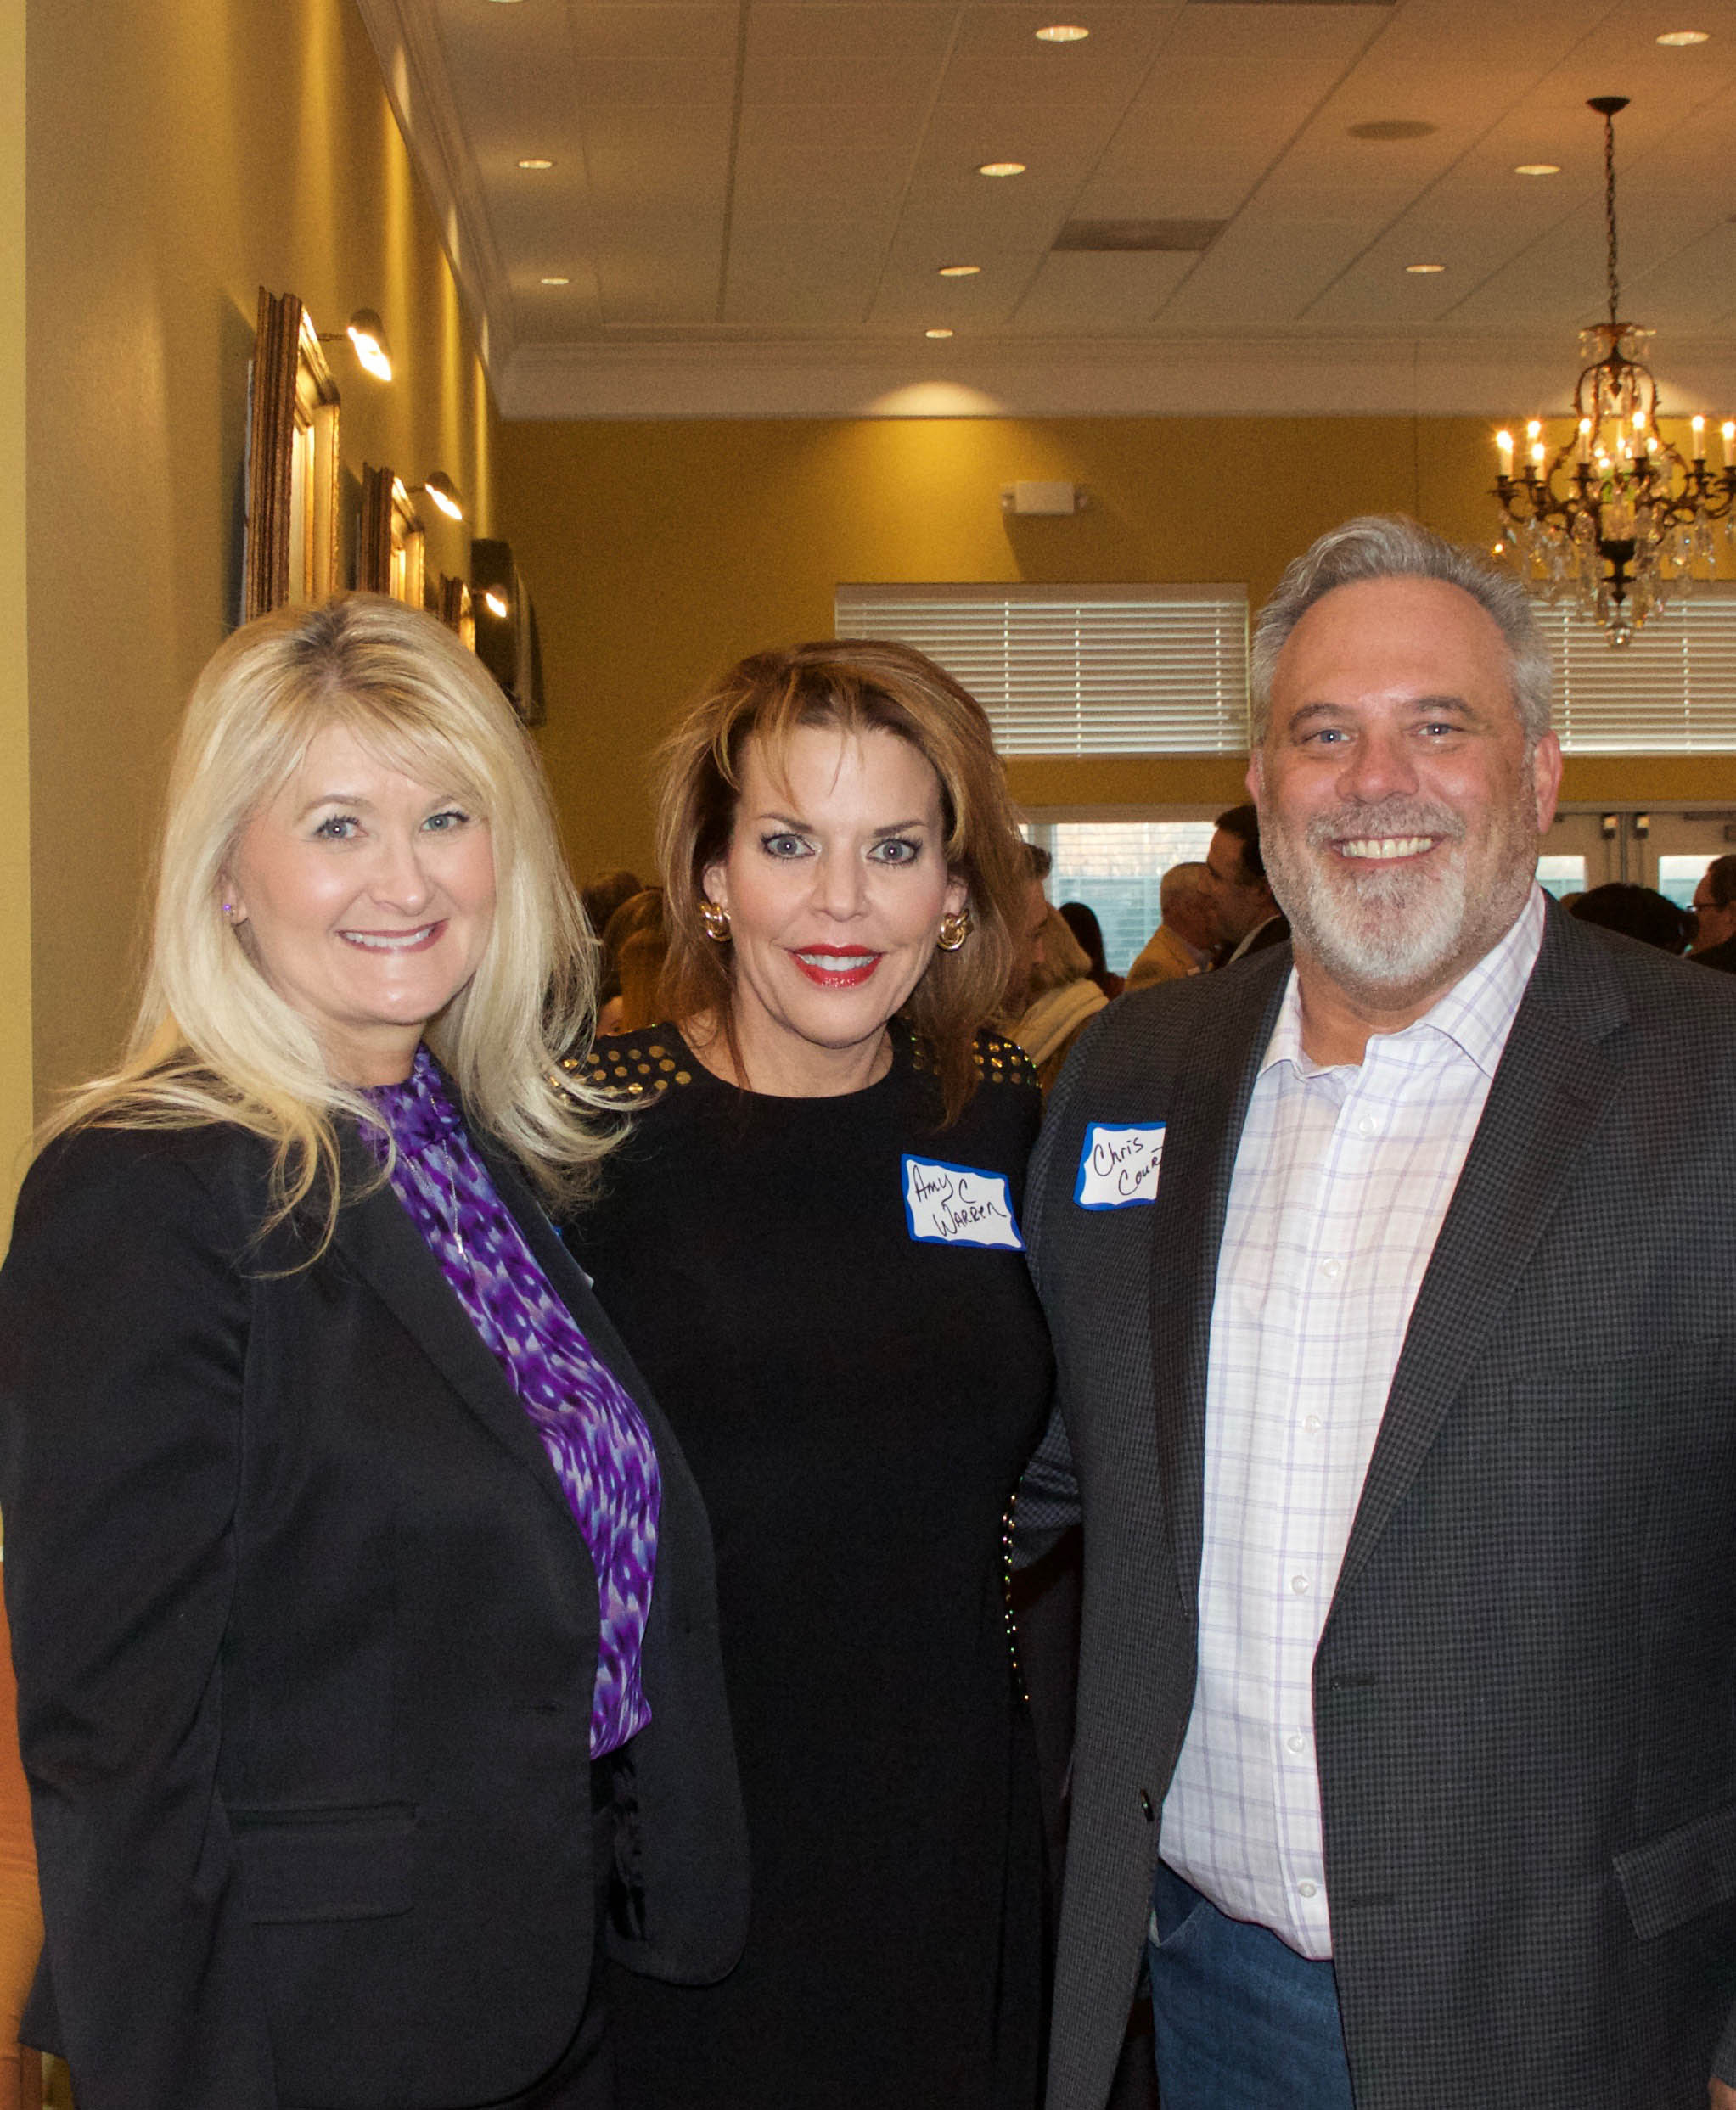 Lisa Sitterley, Amy Warren and Chris Court